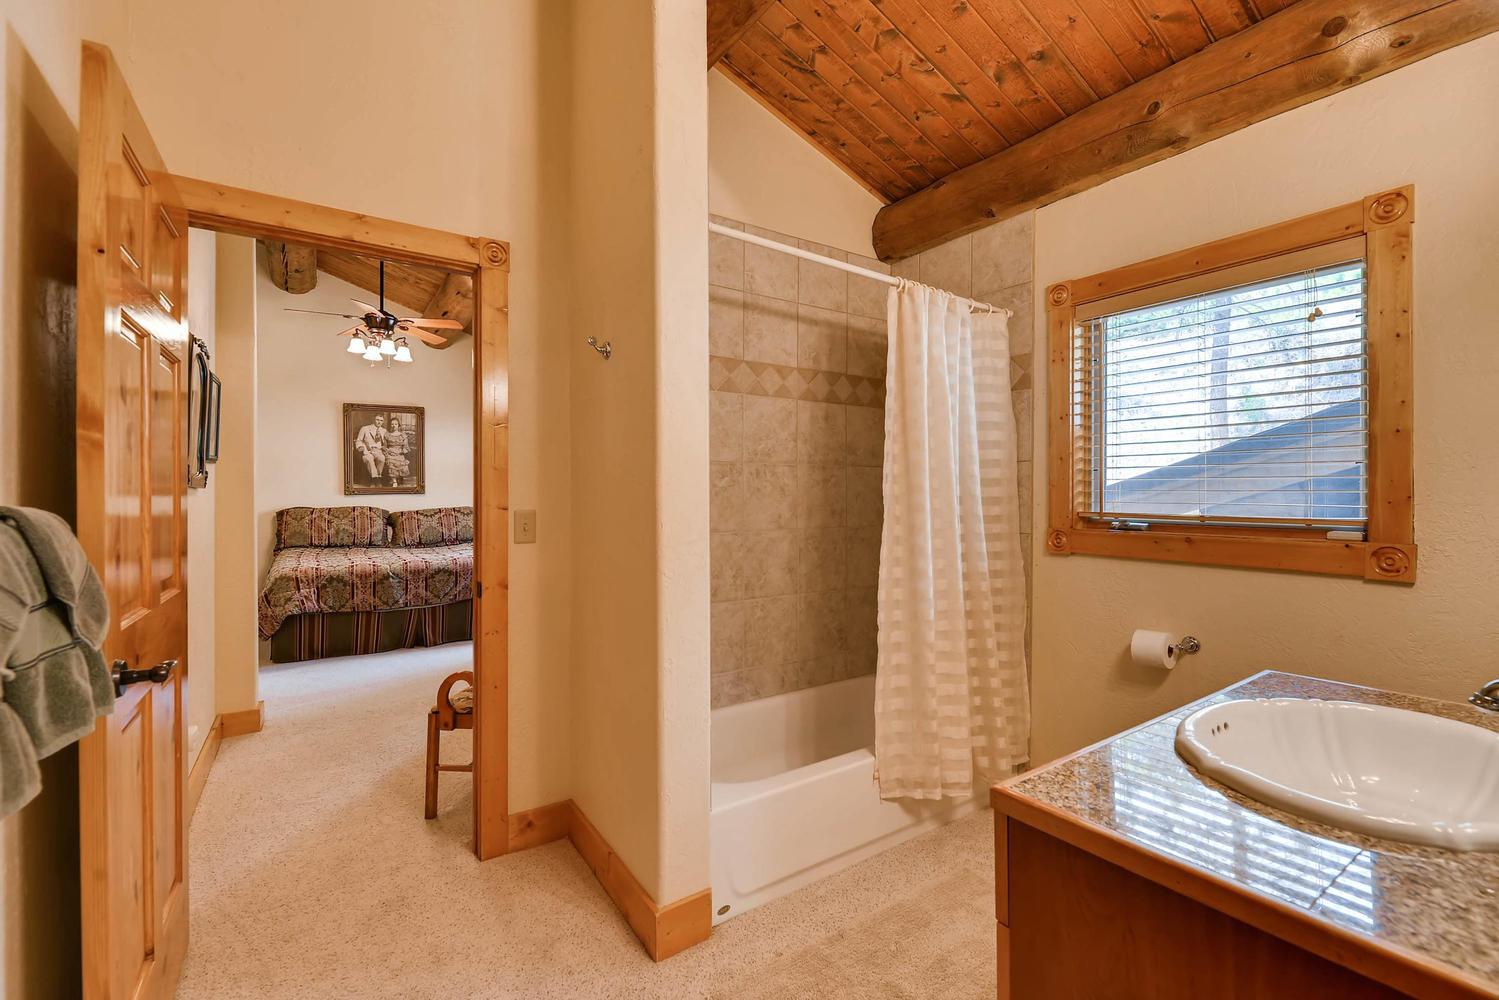 Upper level bathroom has a shower/tub combo.